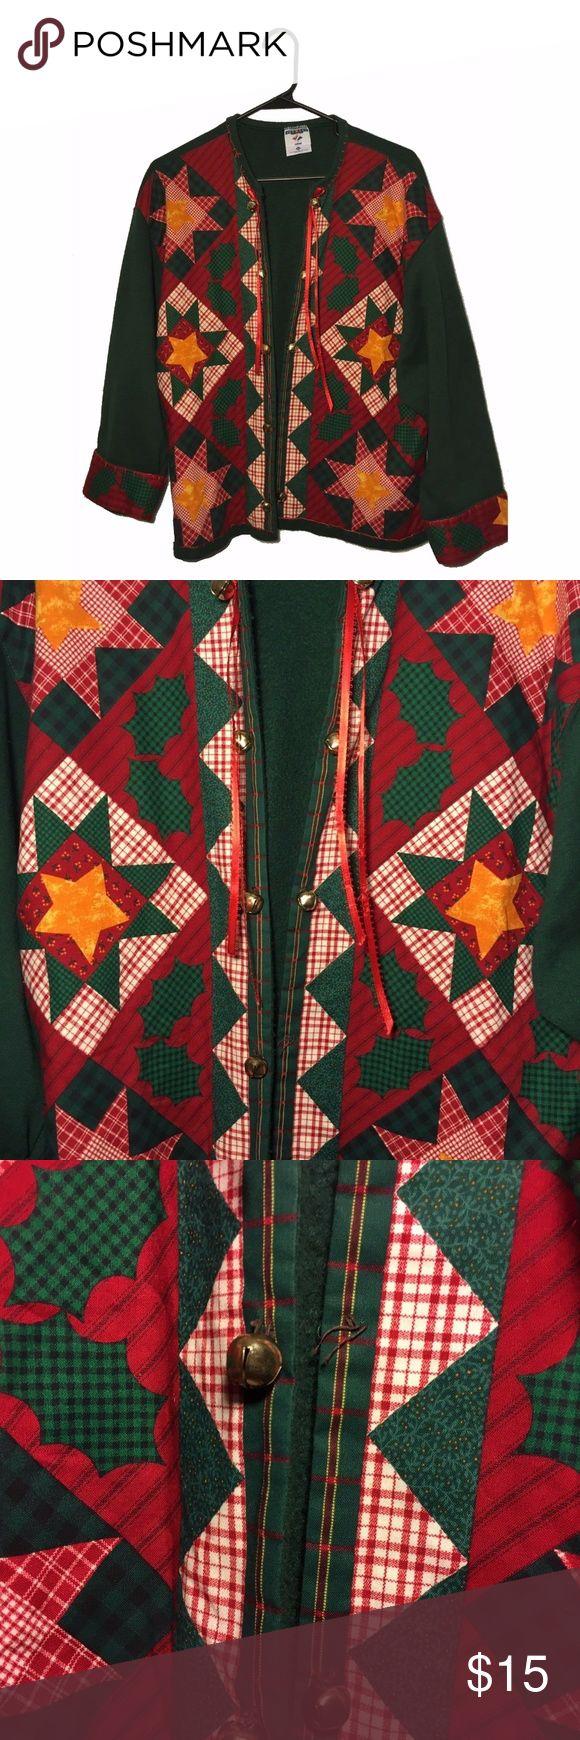 más de 25 ideas increíbles sobre ugly christmas sweater women en